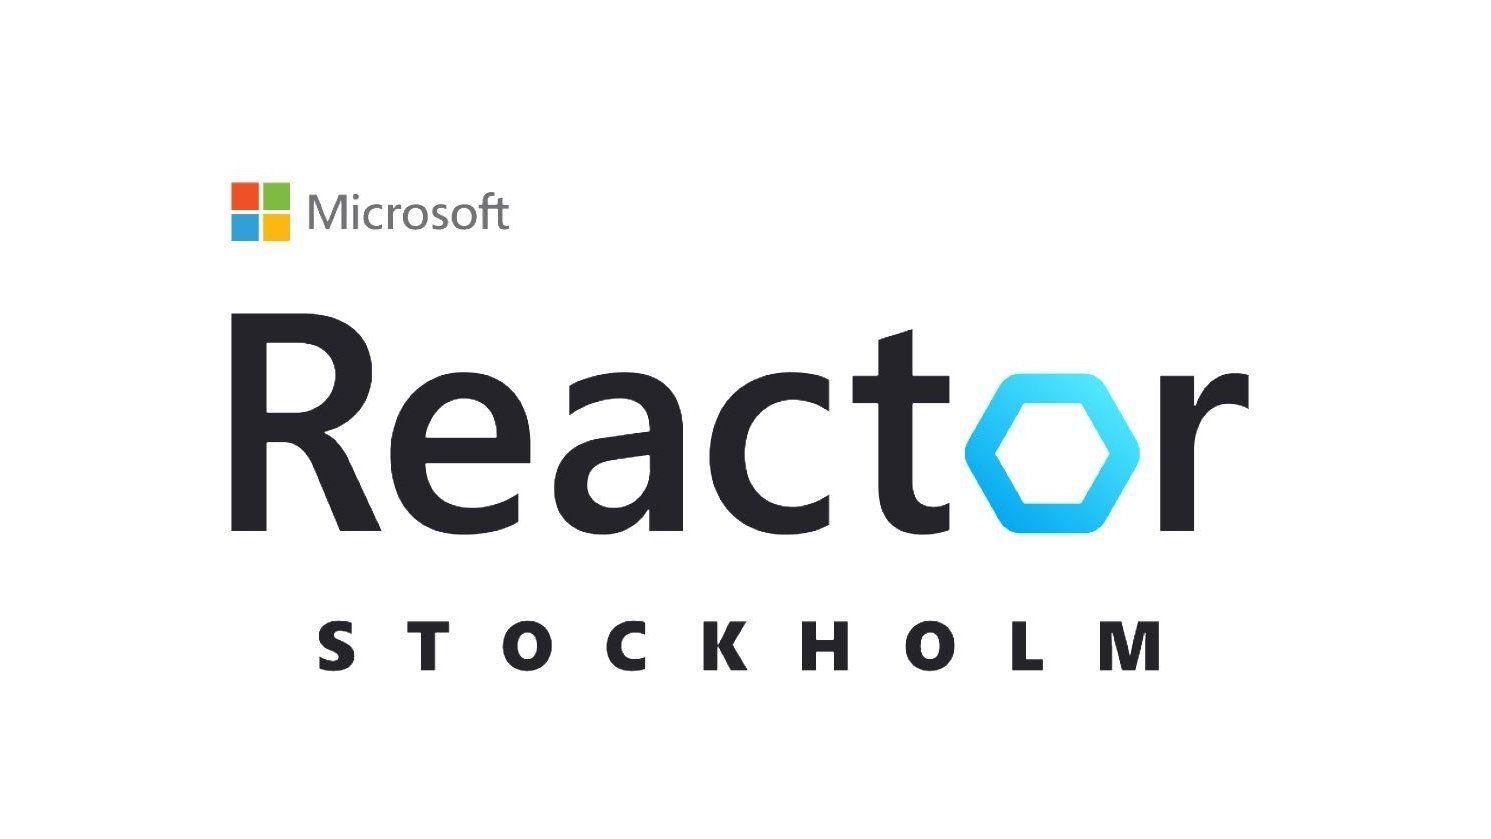 Microsoft Reactor Stockholm